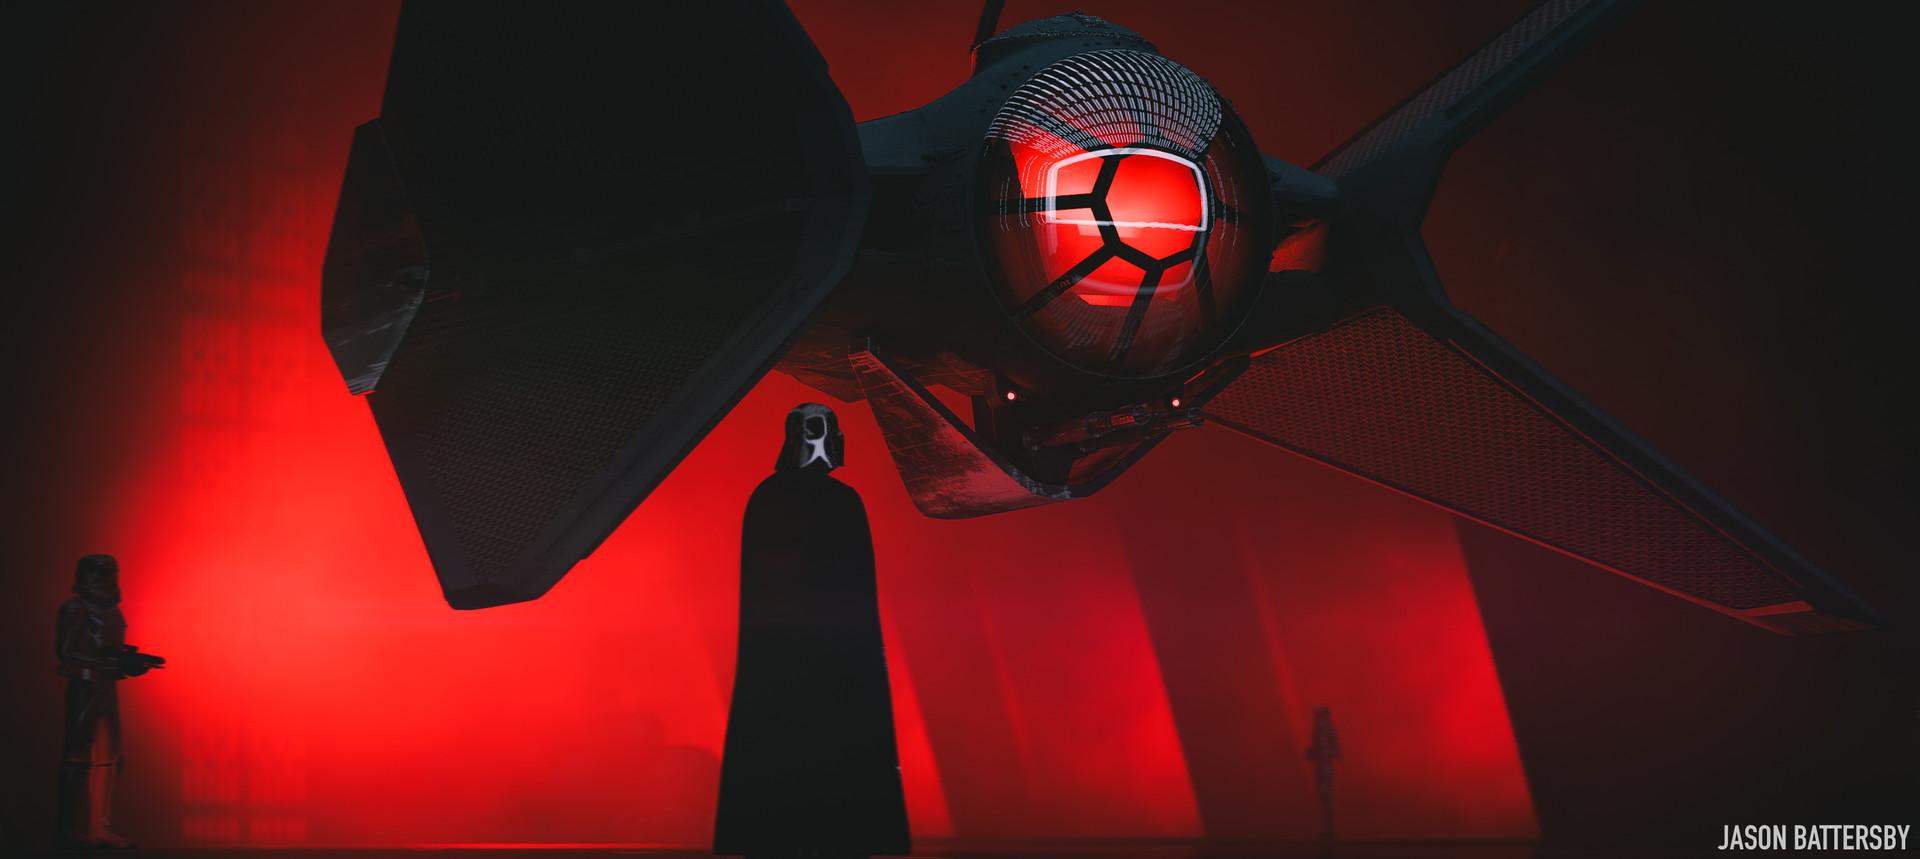 Wallpaper 1920x859 Px Concept Art Darth Vader Digital Art Jason Battersby Red Star Wars Tie Fighter 1920x859 Coolwallpapers 1435713 Hd Wallpapers Wallhere